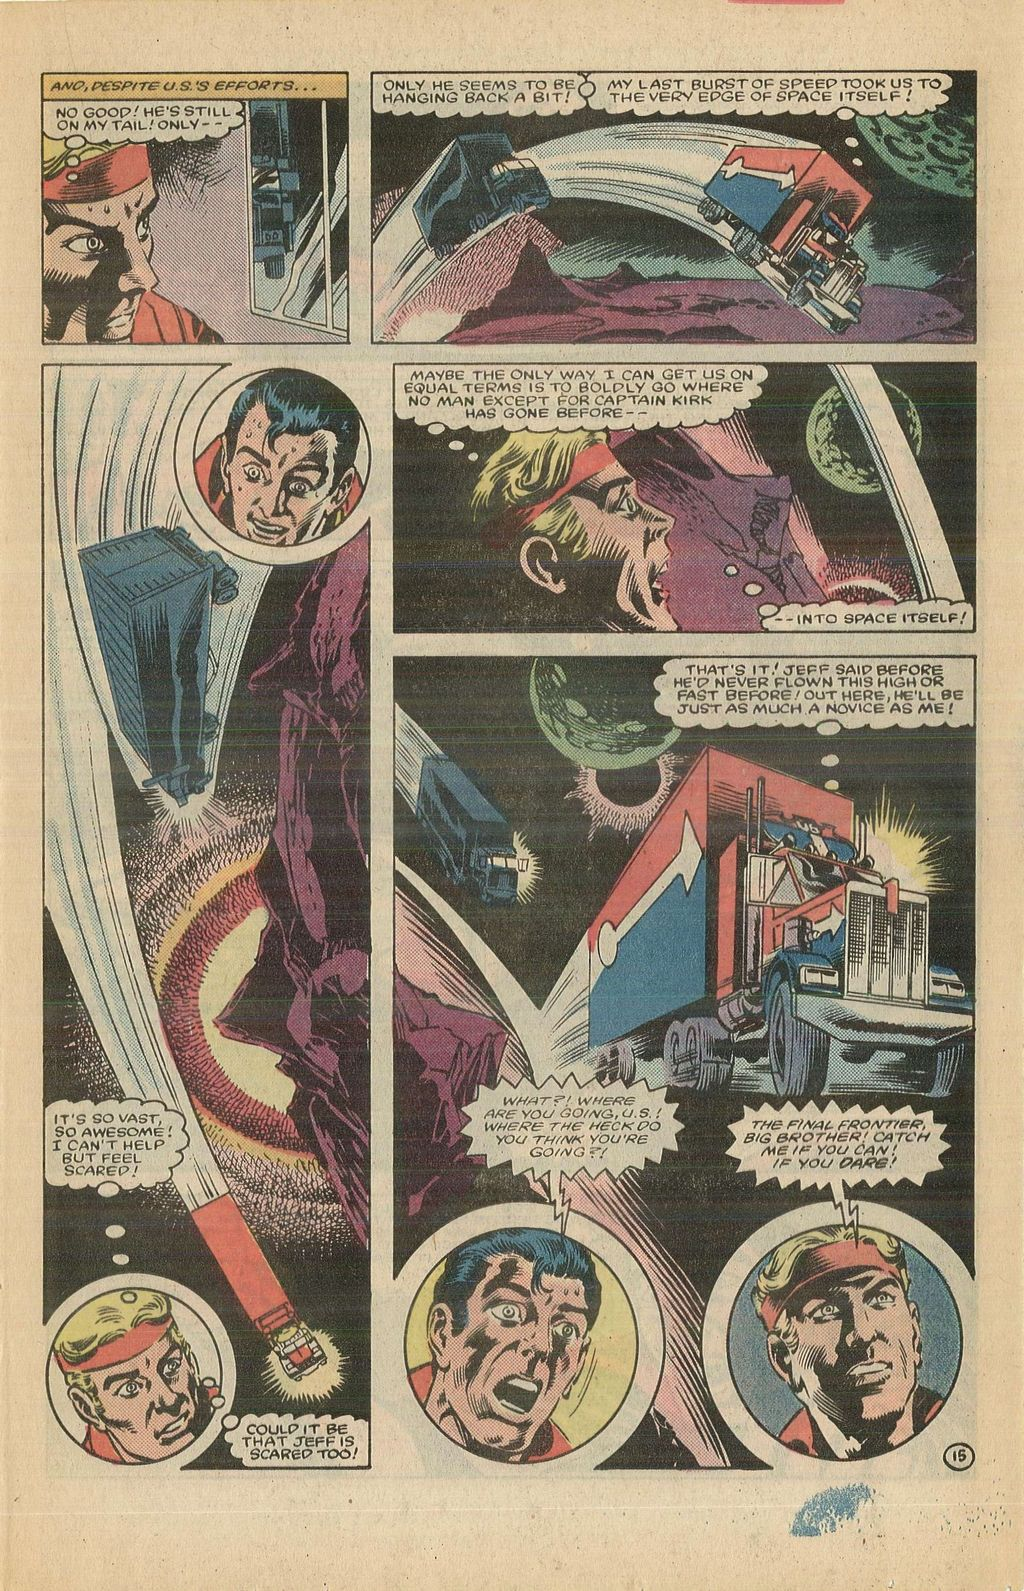 Read online U.S. 1 comic -  Issue #12 - 21